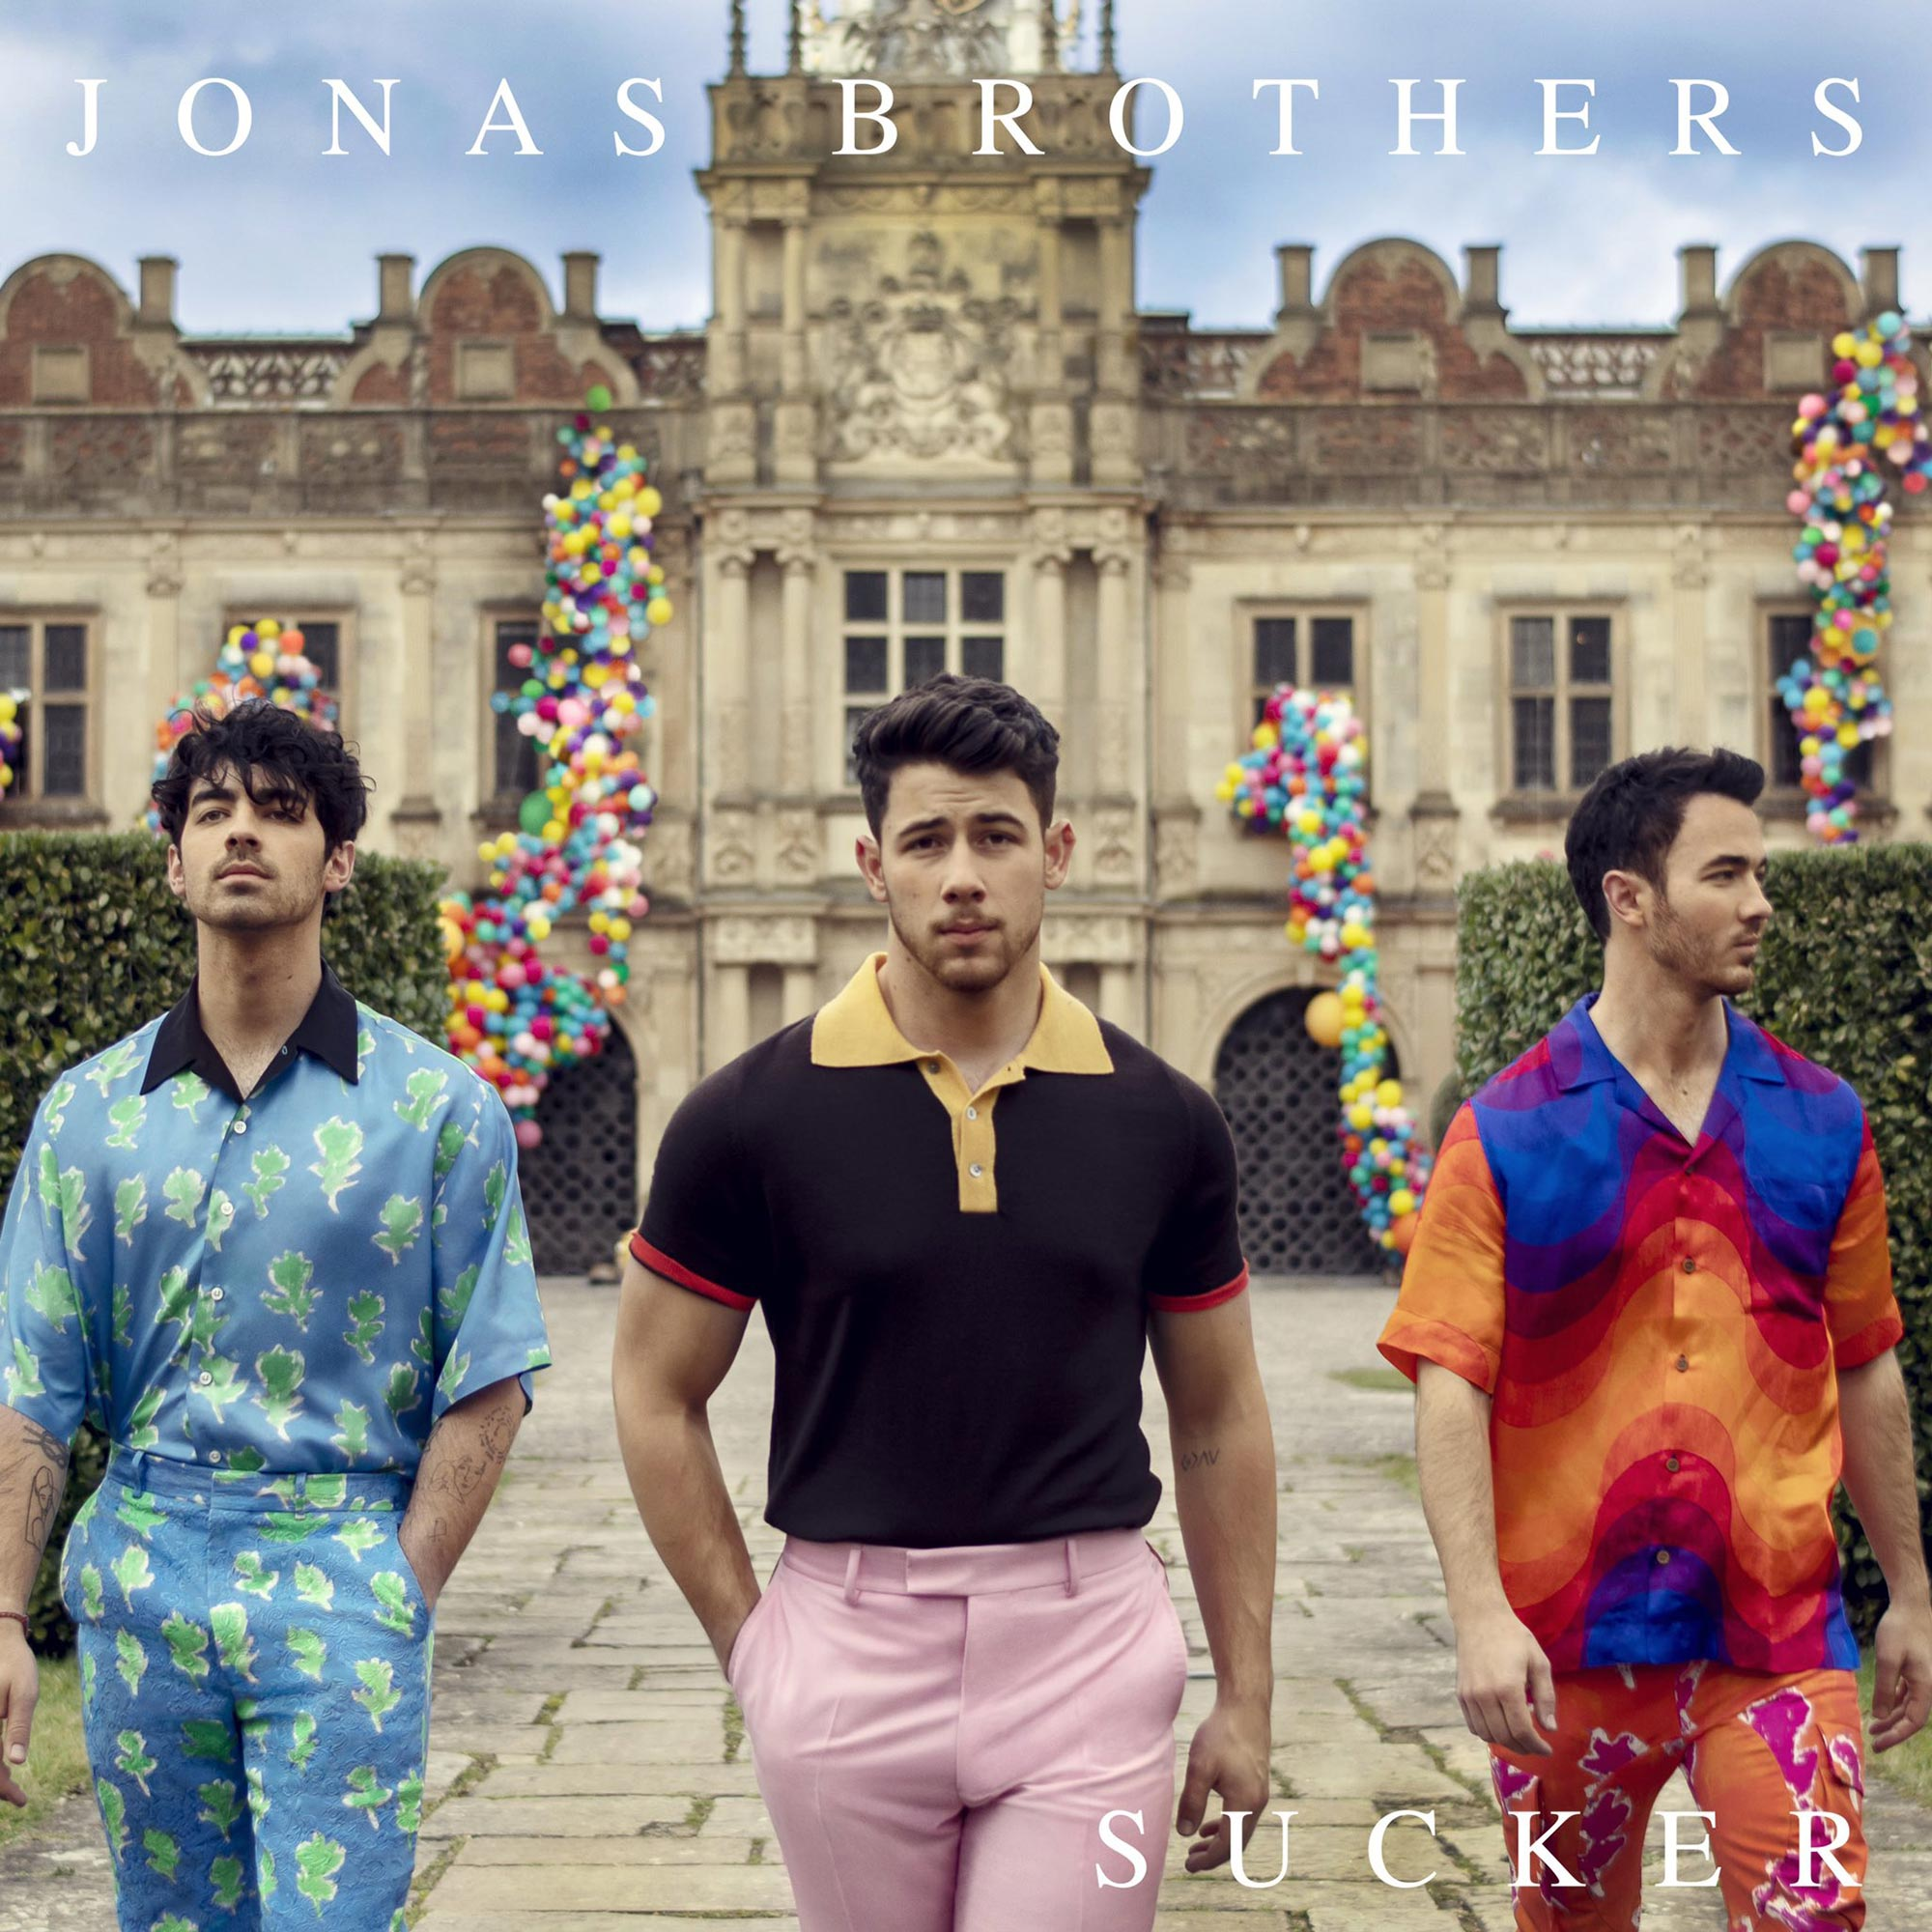 Jonas Brothers Music Video Sophie Turner Priyanka Chopra